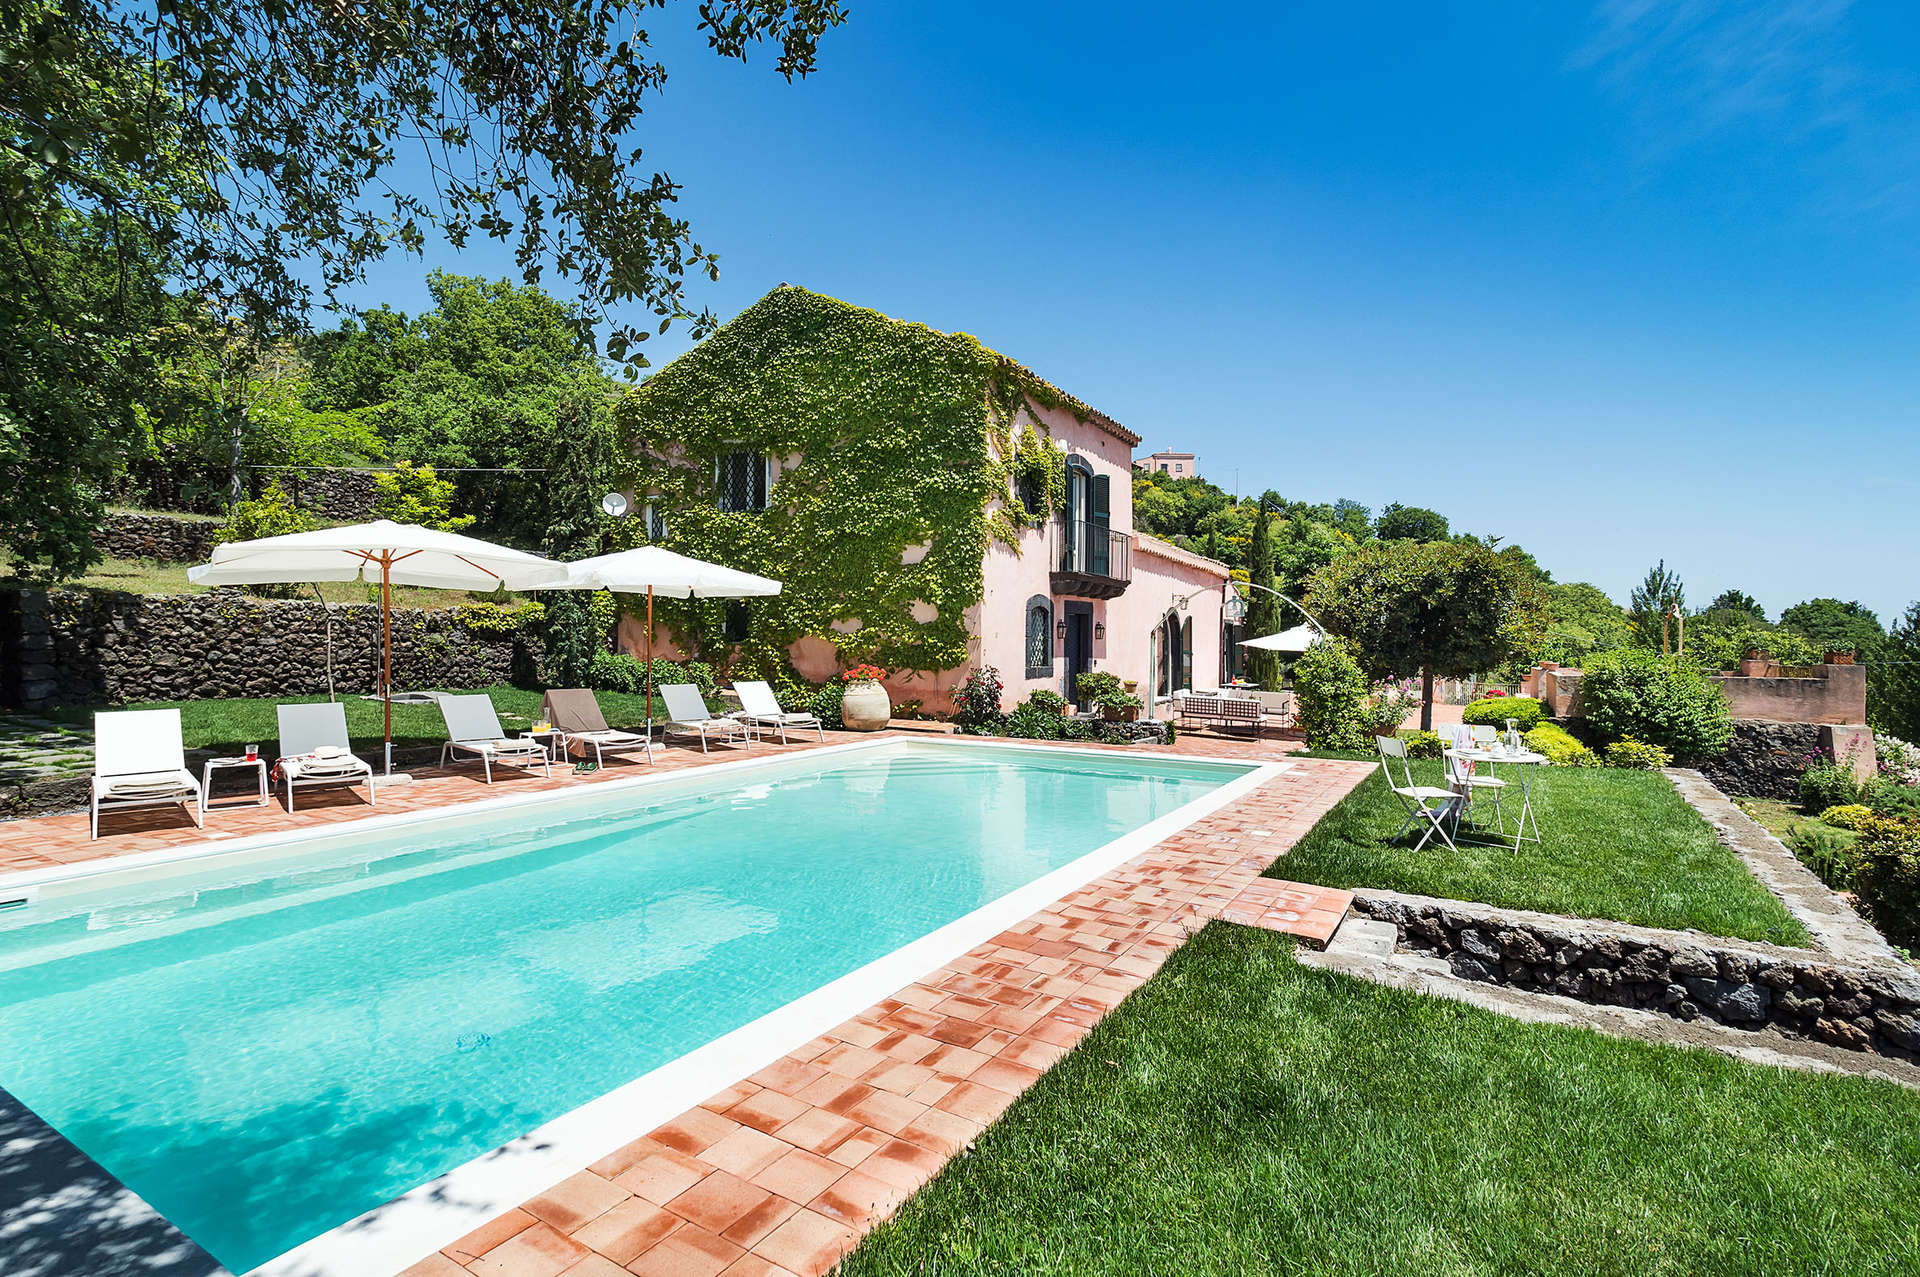 Luxury vacation rentals europe - Italy - Sicily - Monte ilice - La Capinera - Image 1/41